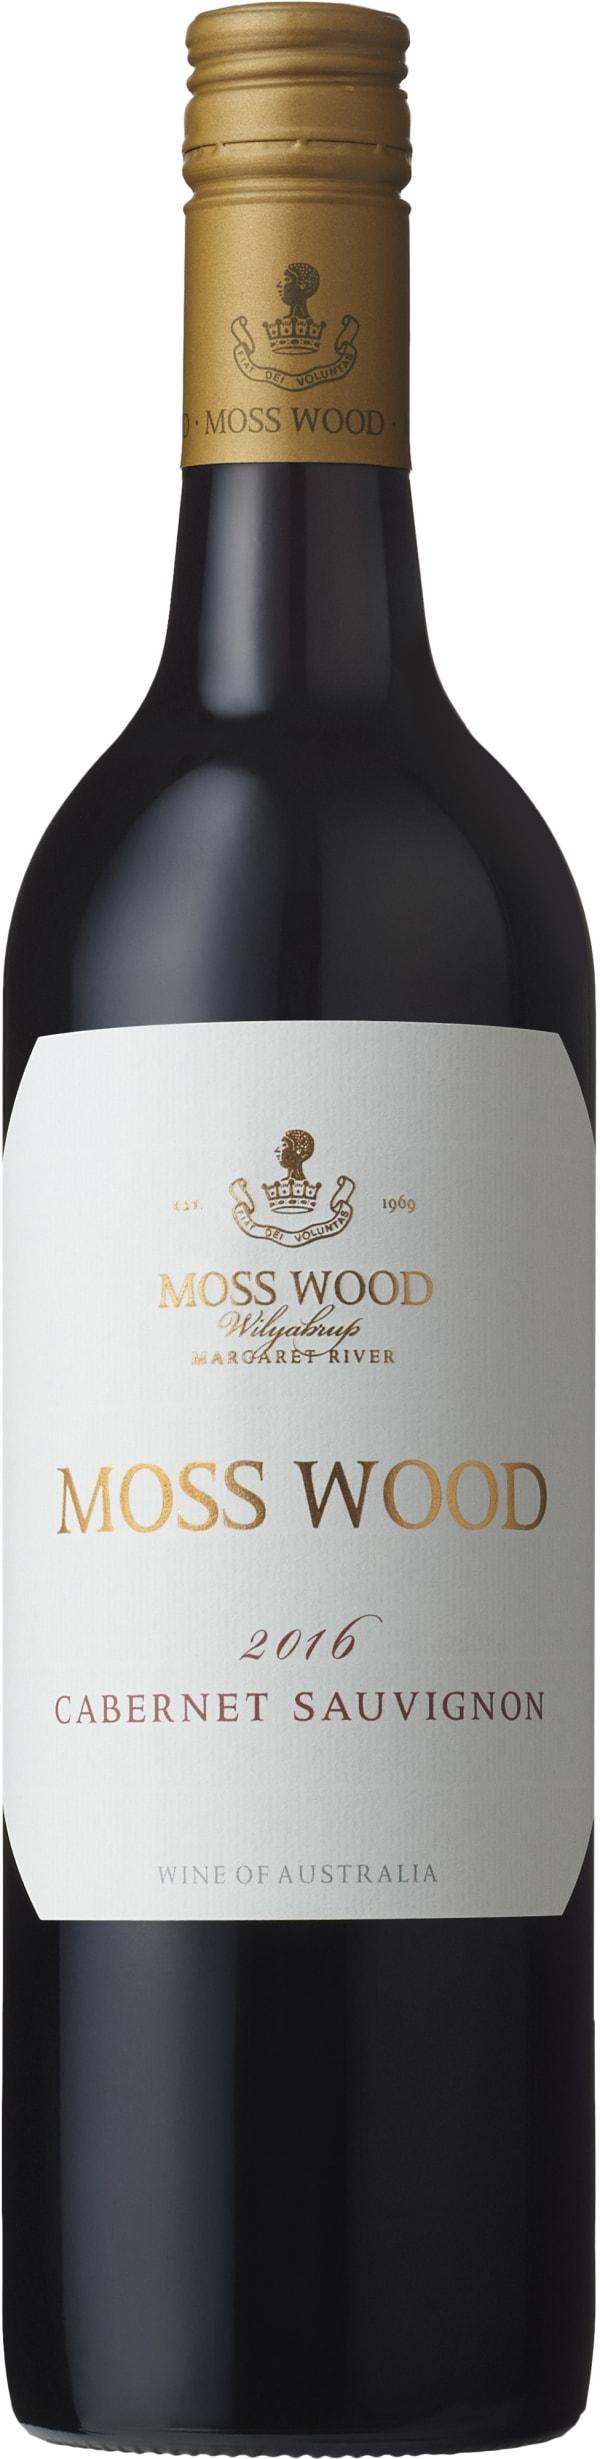 Moss Wood Cabernet Sauvignon 2016